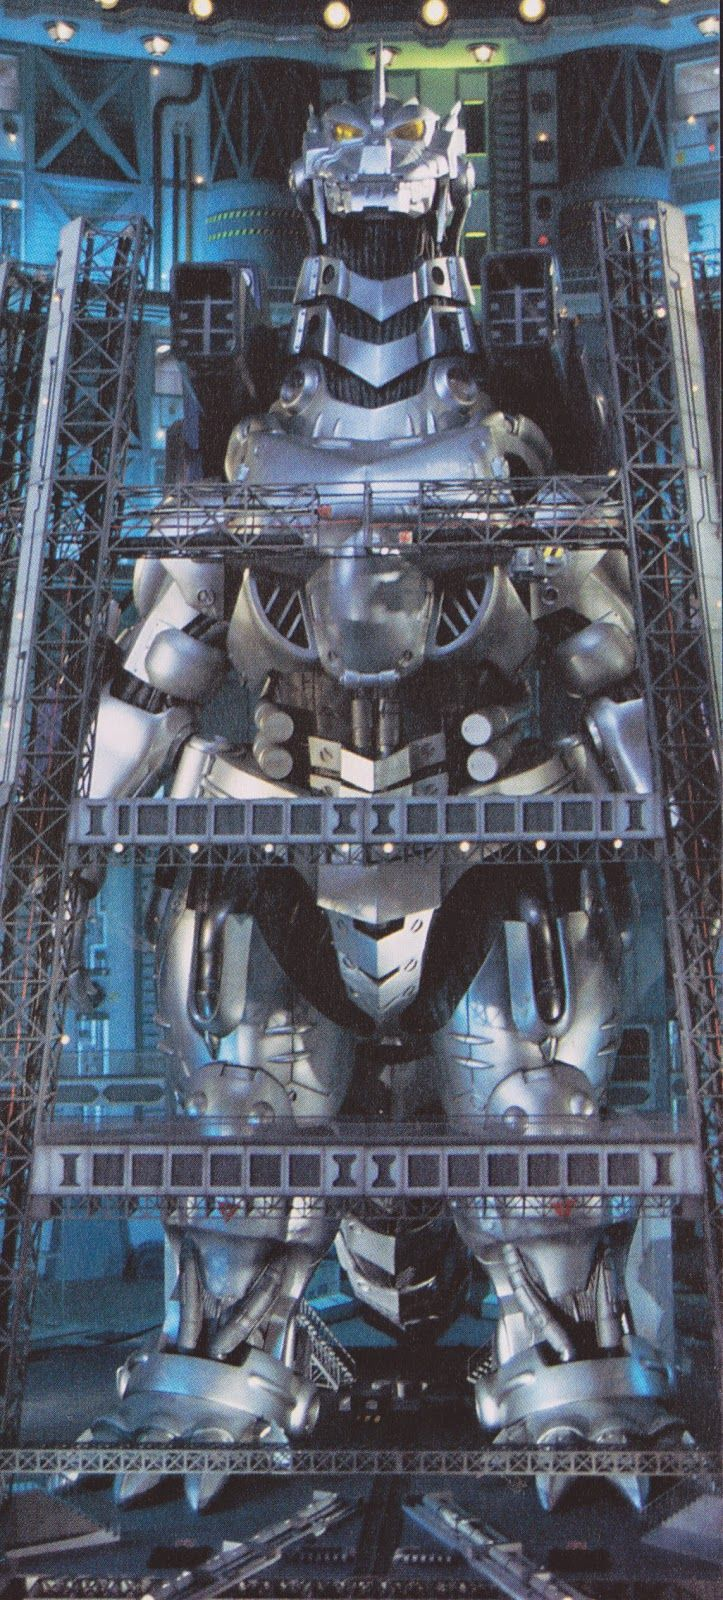 Kiryu 2002, or Mechagodzilla (Godzilla x Mechagodzillan 2002 Toho)